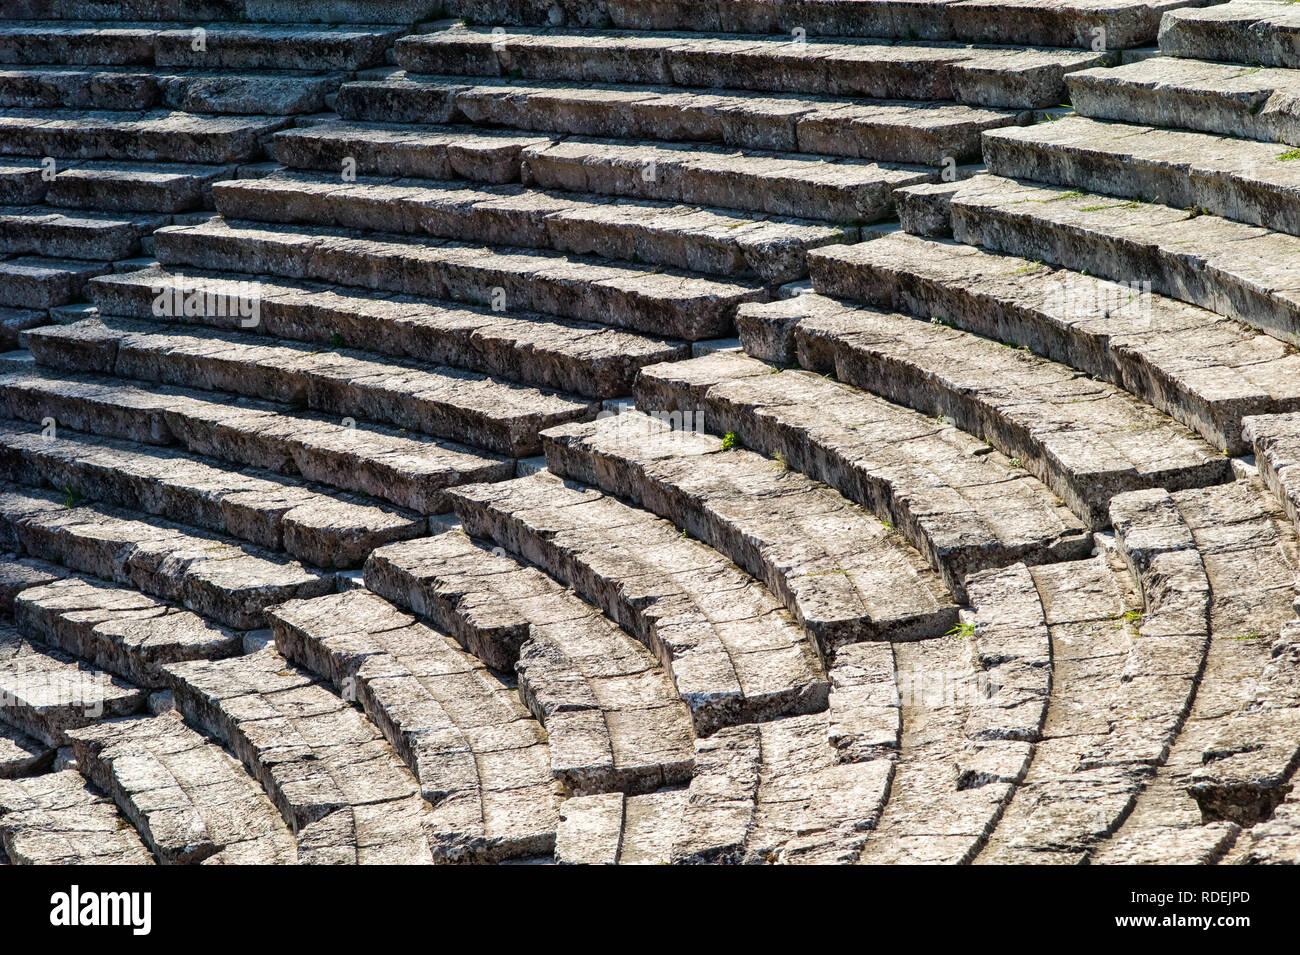 Ancient theatre's seats, Greece - Stock Image